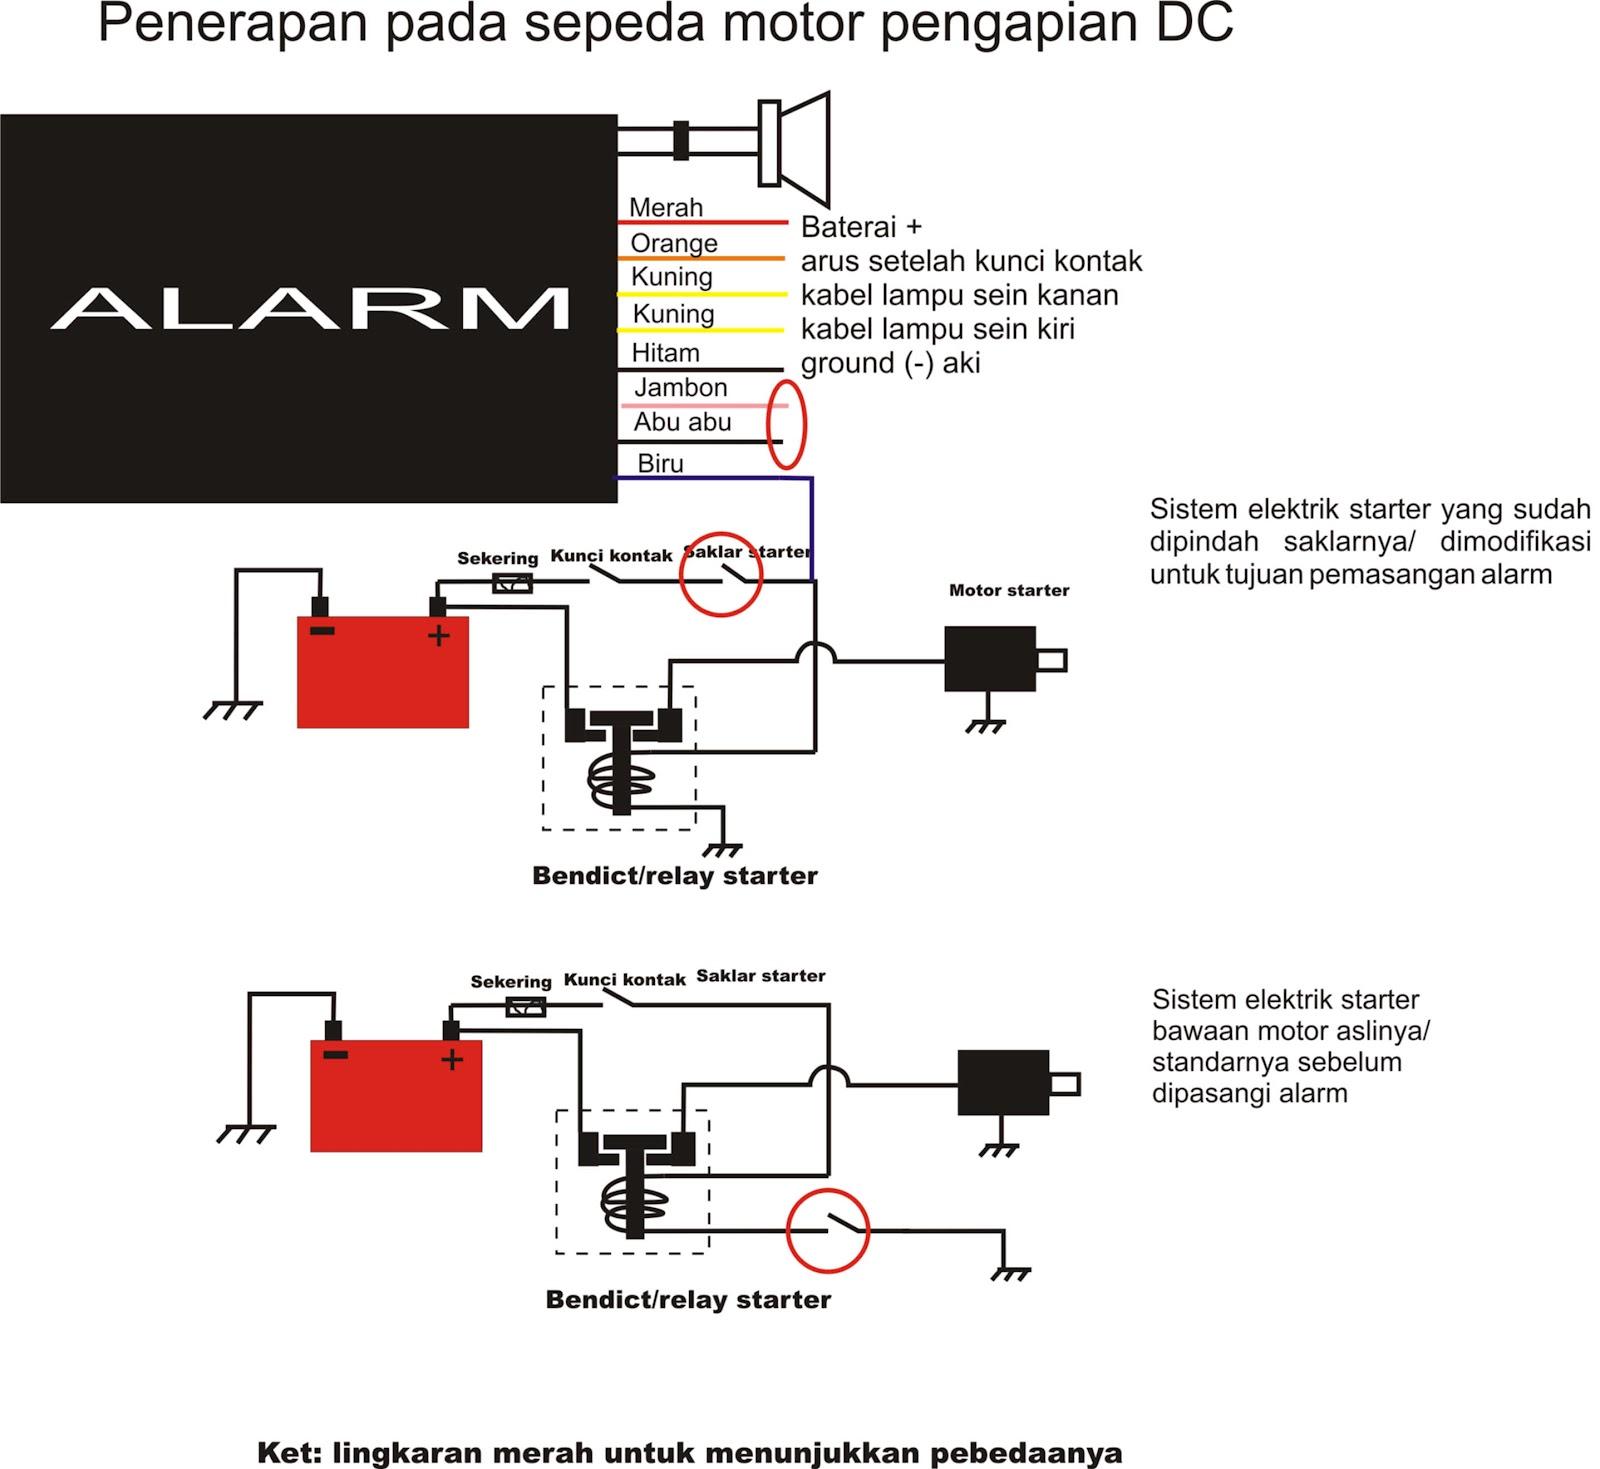 Wiring diagrams alarms subnet mask calulator purpose of gantt chart wiring diagram alarm mobil wiring diagram alarm20konsep201 wiring diagram alarm mobilhtml swarovskicordoba Image collections